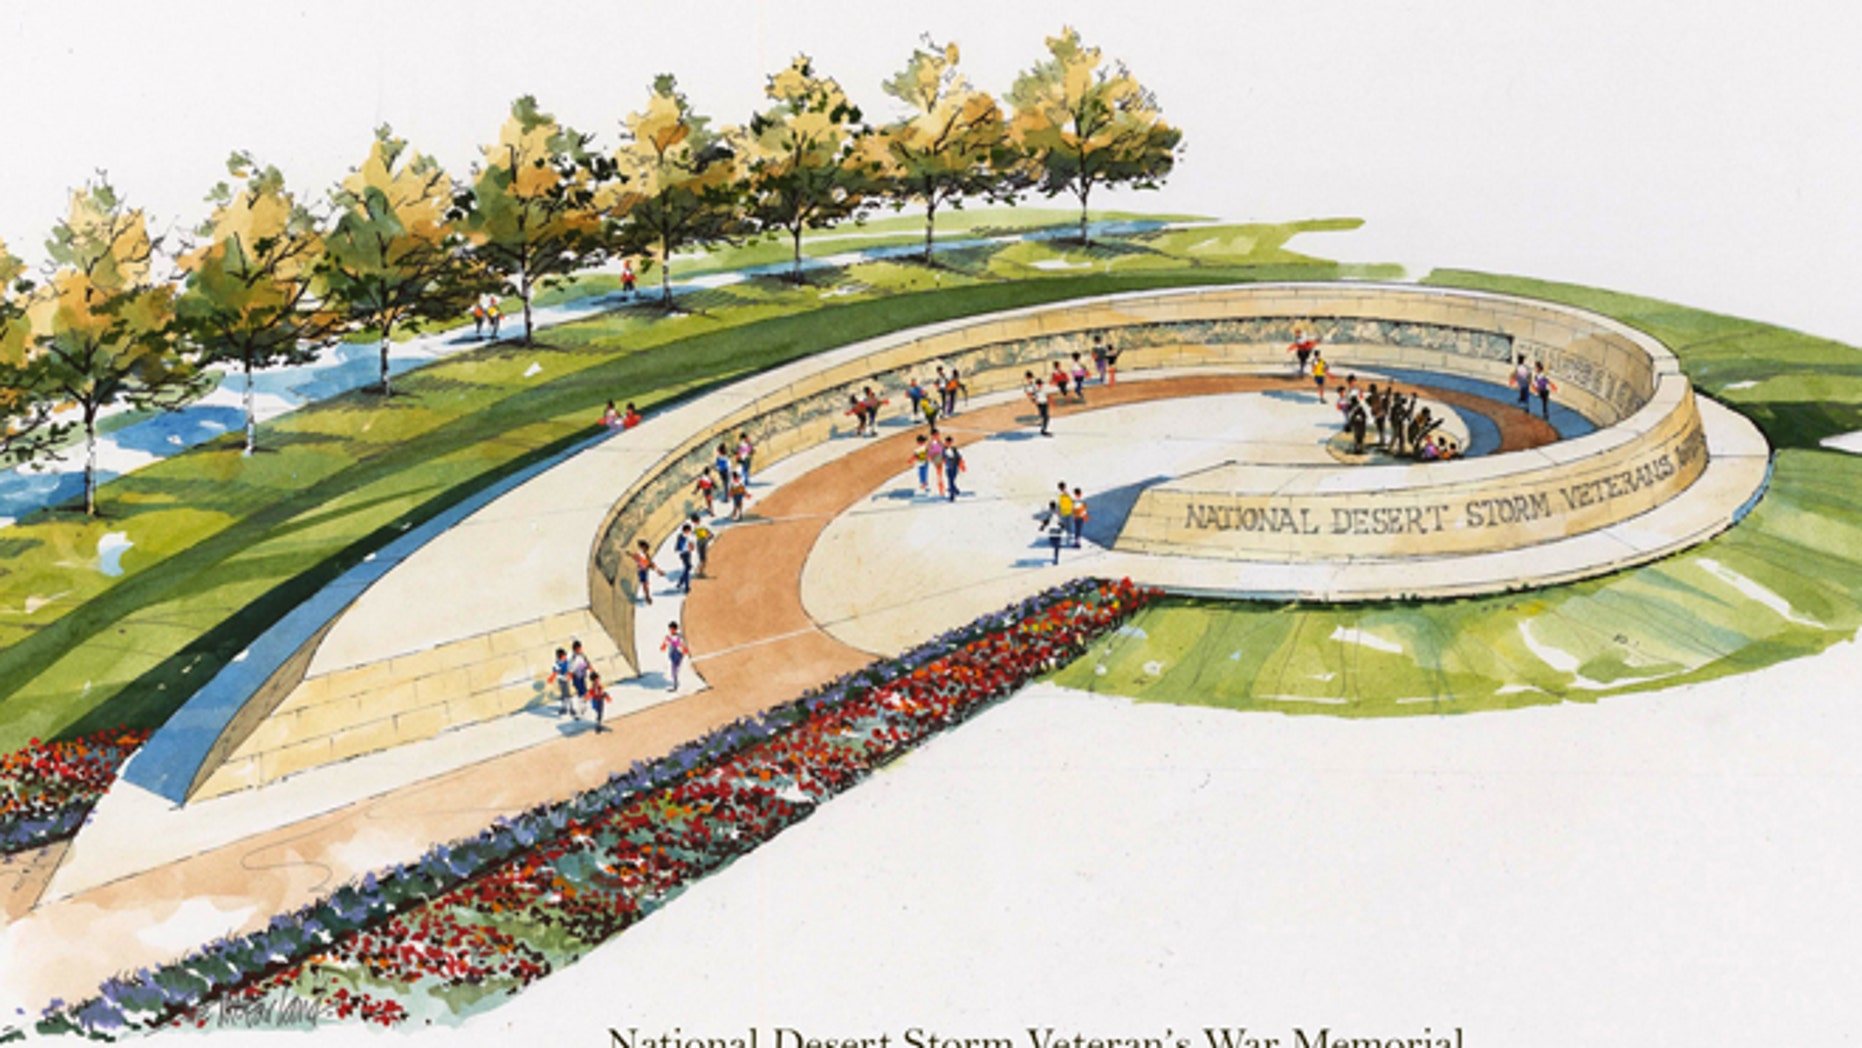 Shown here is a rendering of the proposed National Desert Storm Veteran's War Memorial.